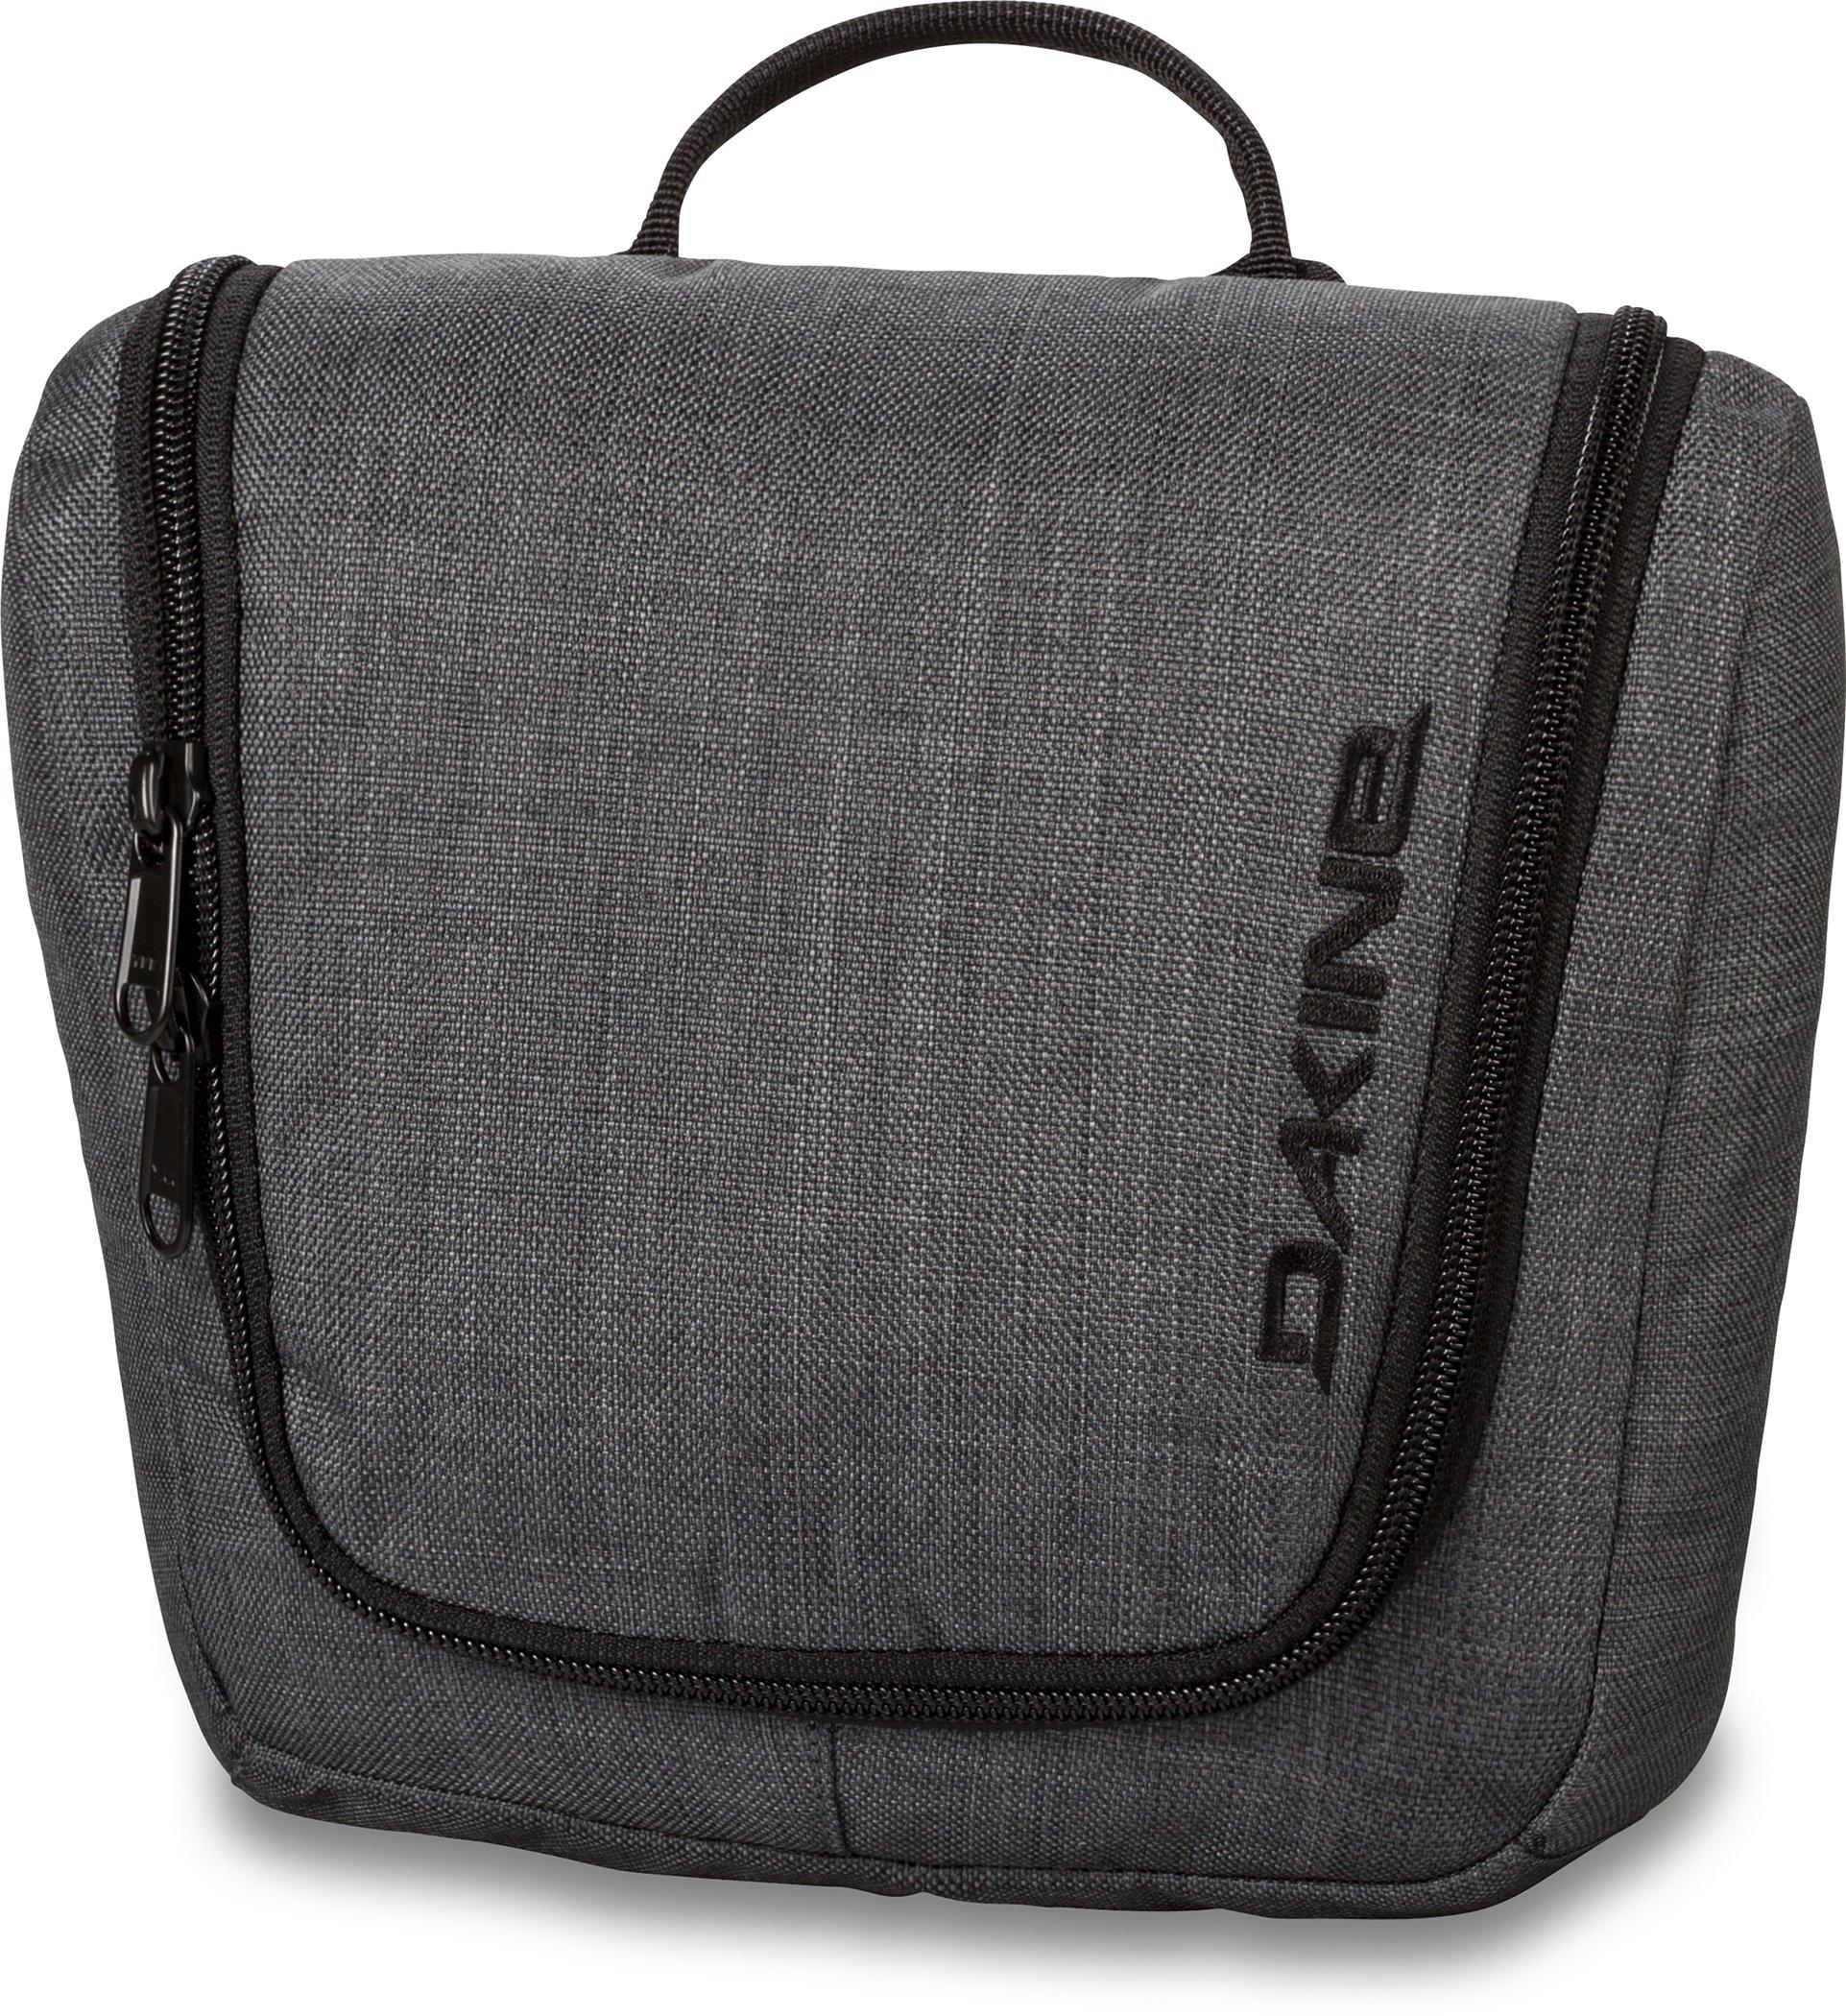 Dakine Travel Kit Toiletry Bag, One Size, Carbon